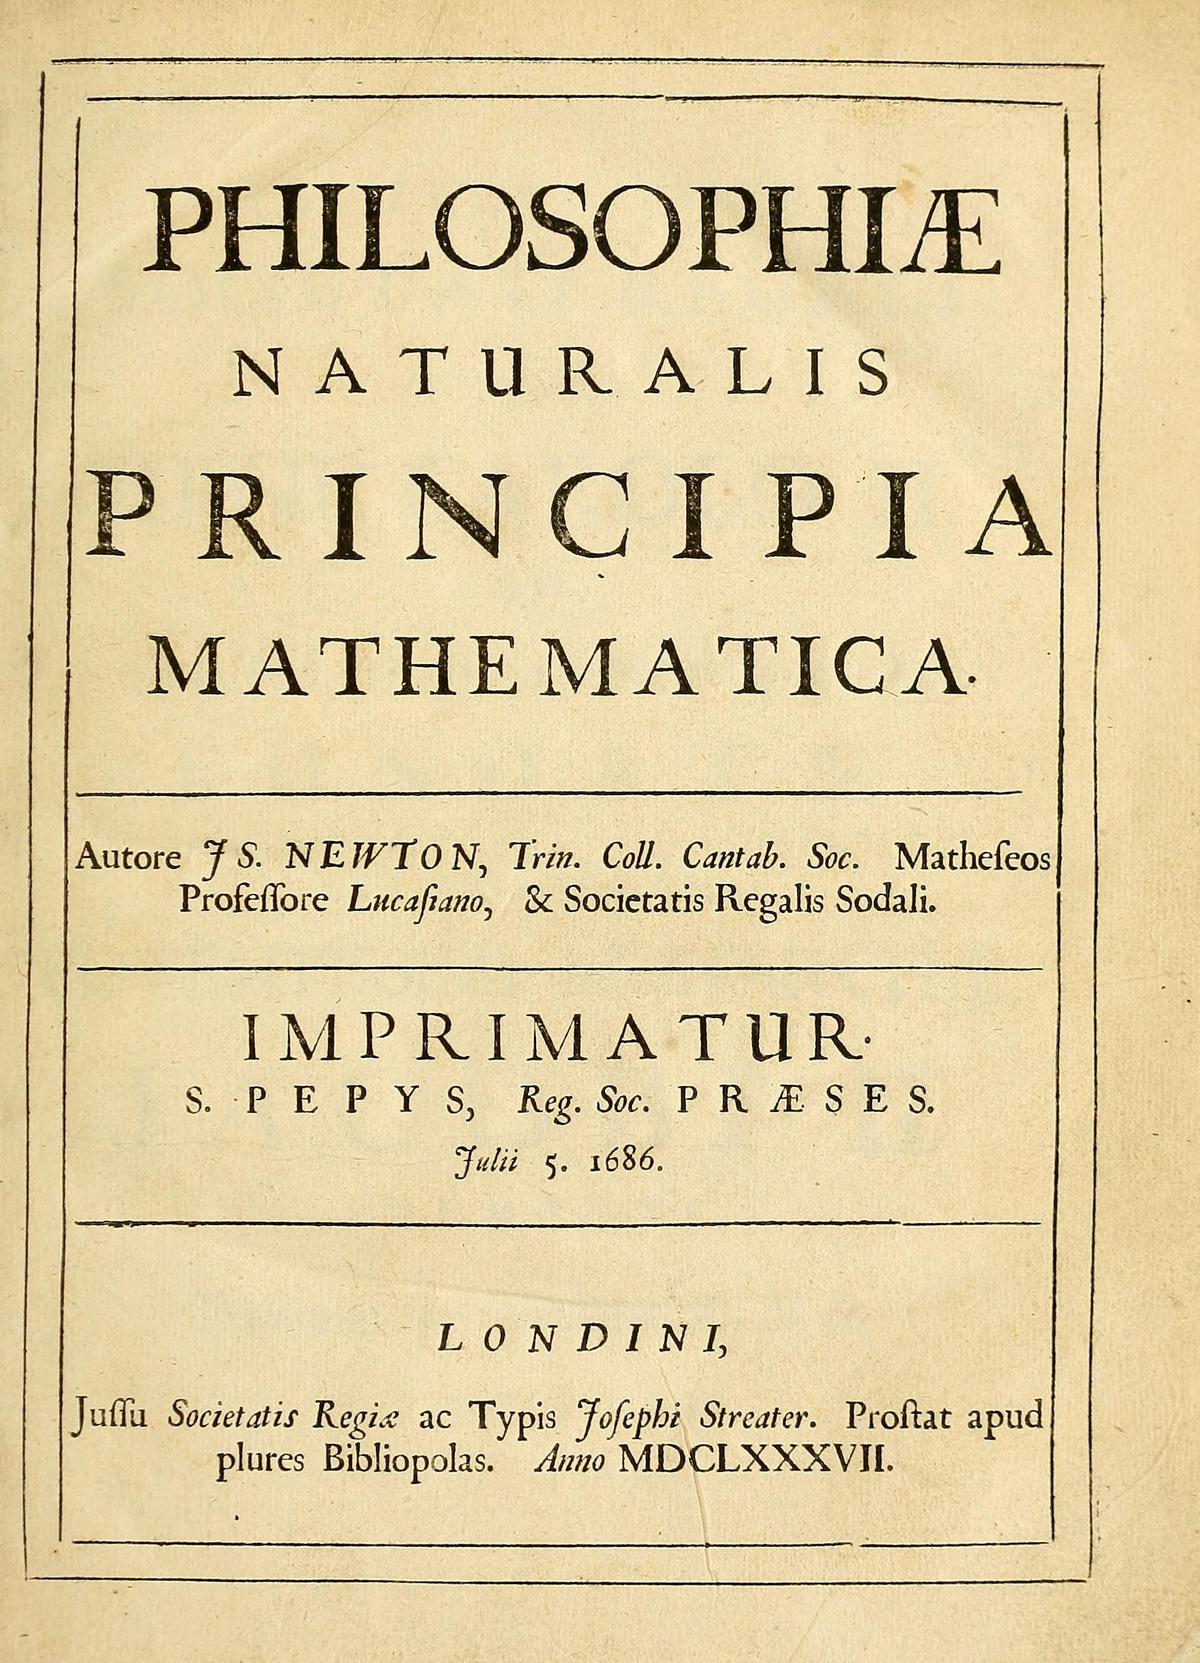 http://www.math.drexel.edu/~tolya/title.png